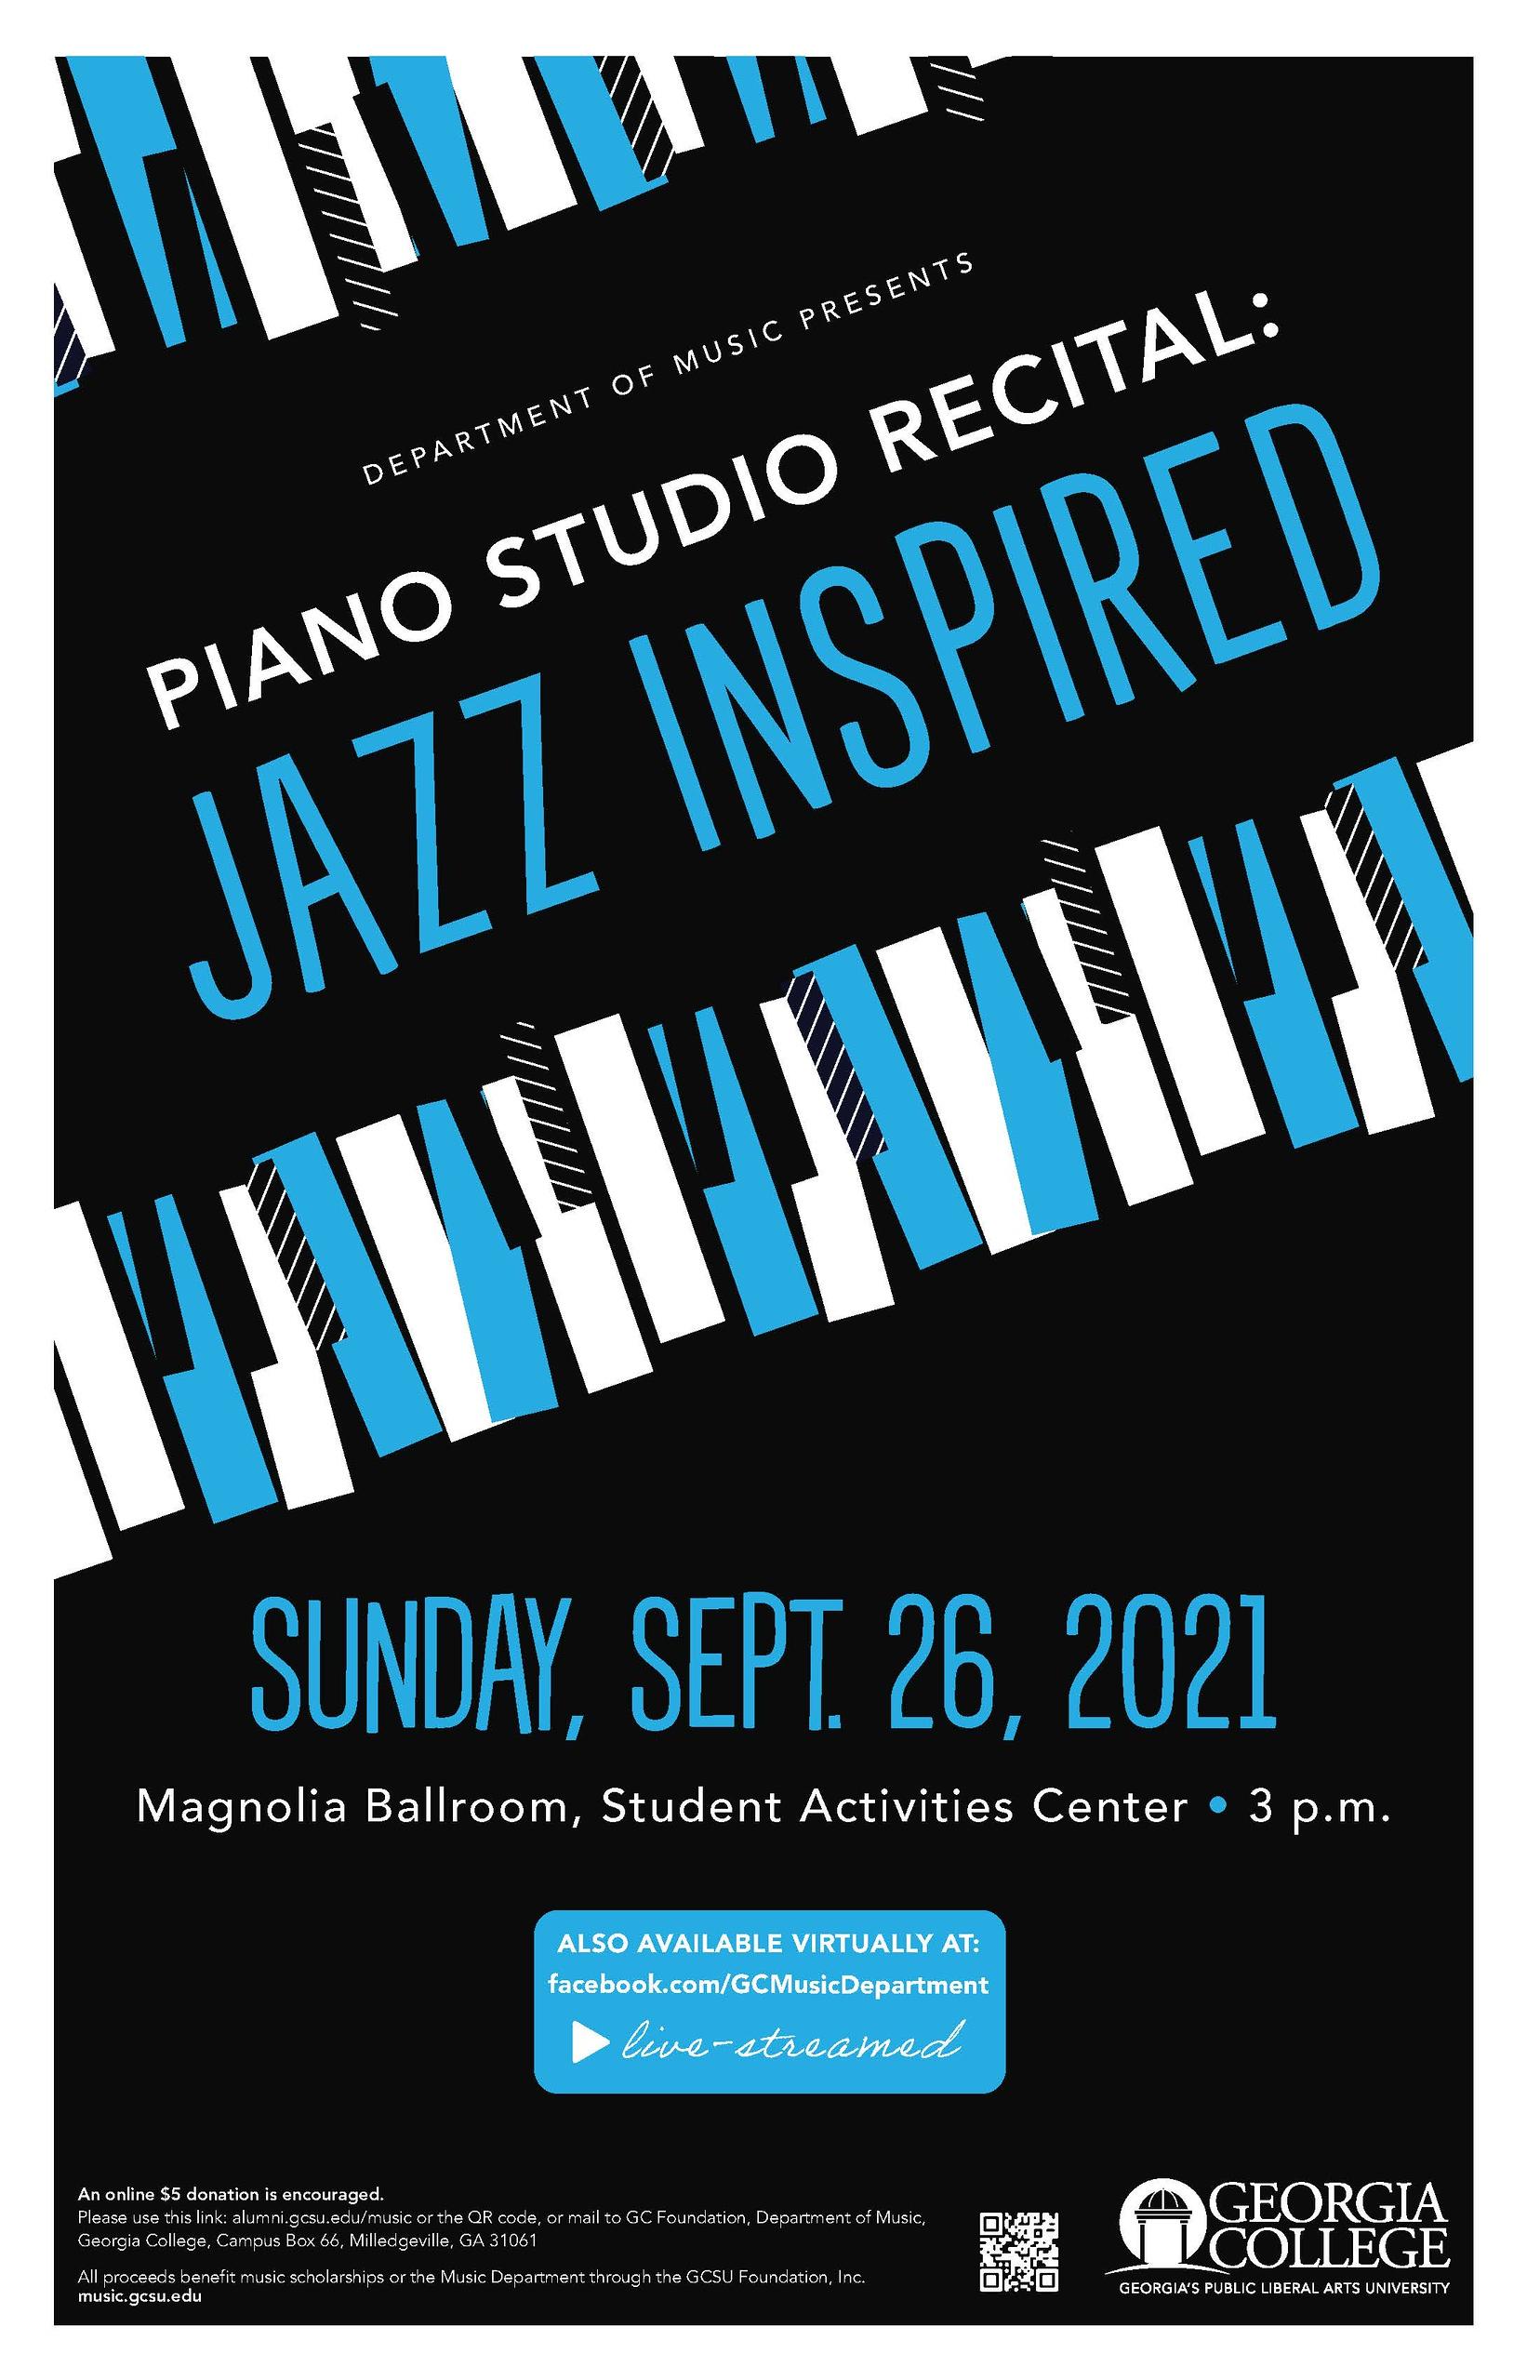 Please join us Sunday, Sept. 26, 3 pm, at Magnolia Ballroom or virtually.